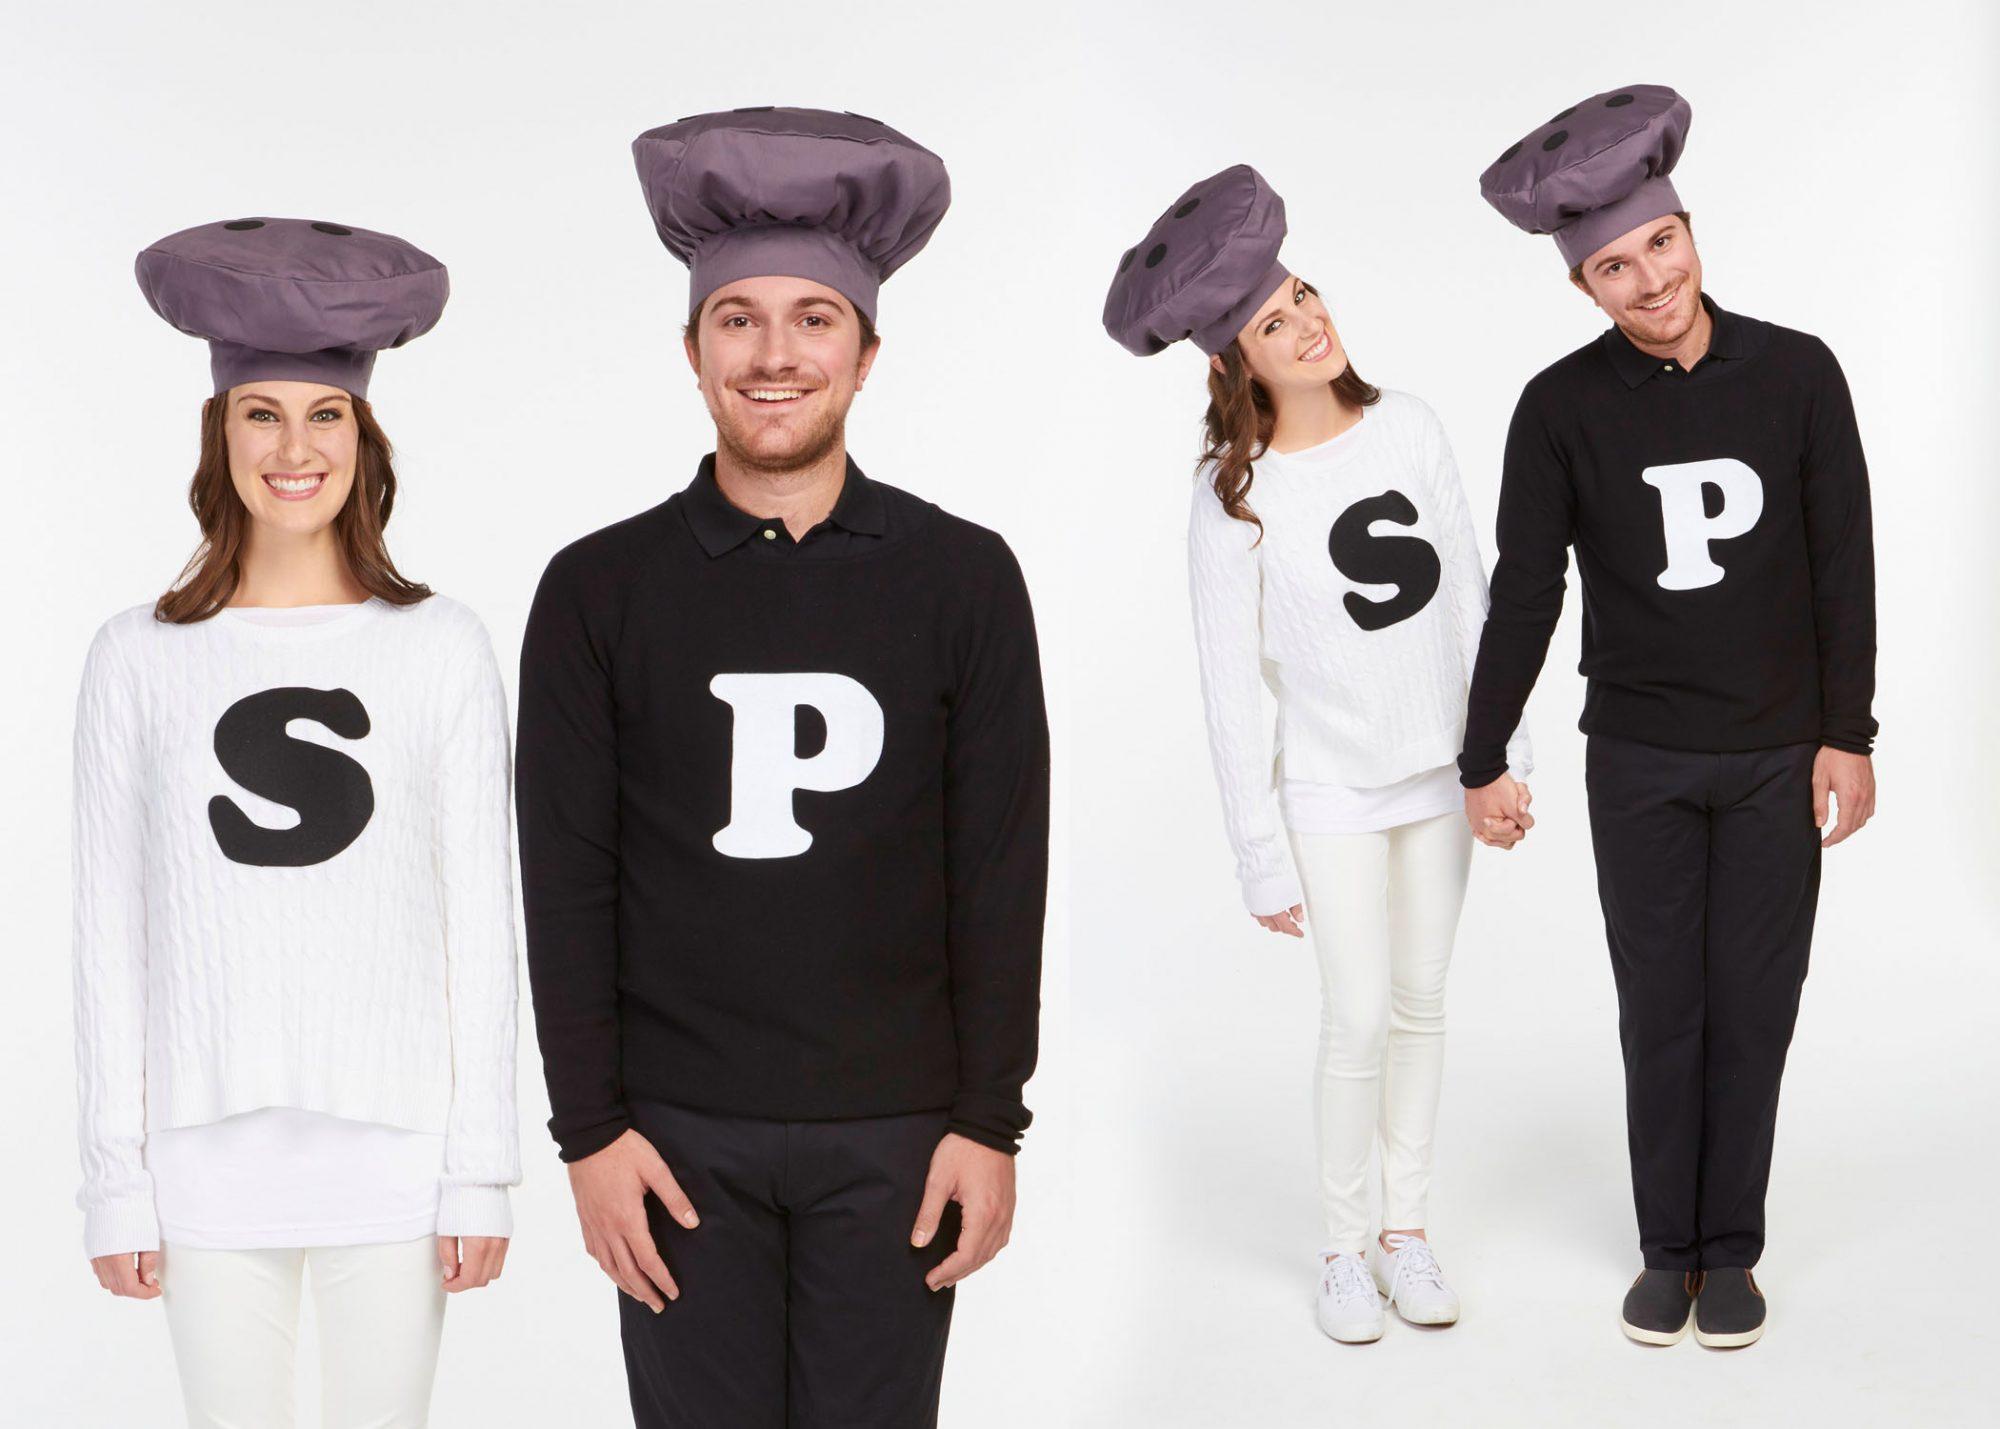 salt and pepper costume